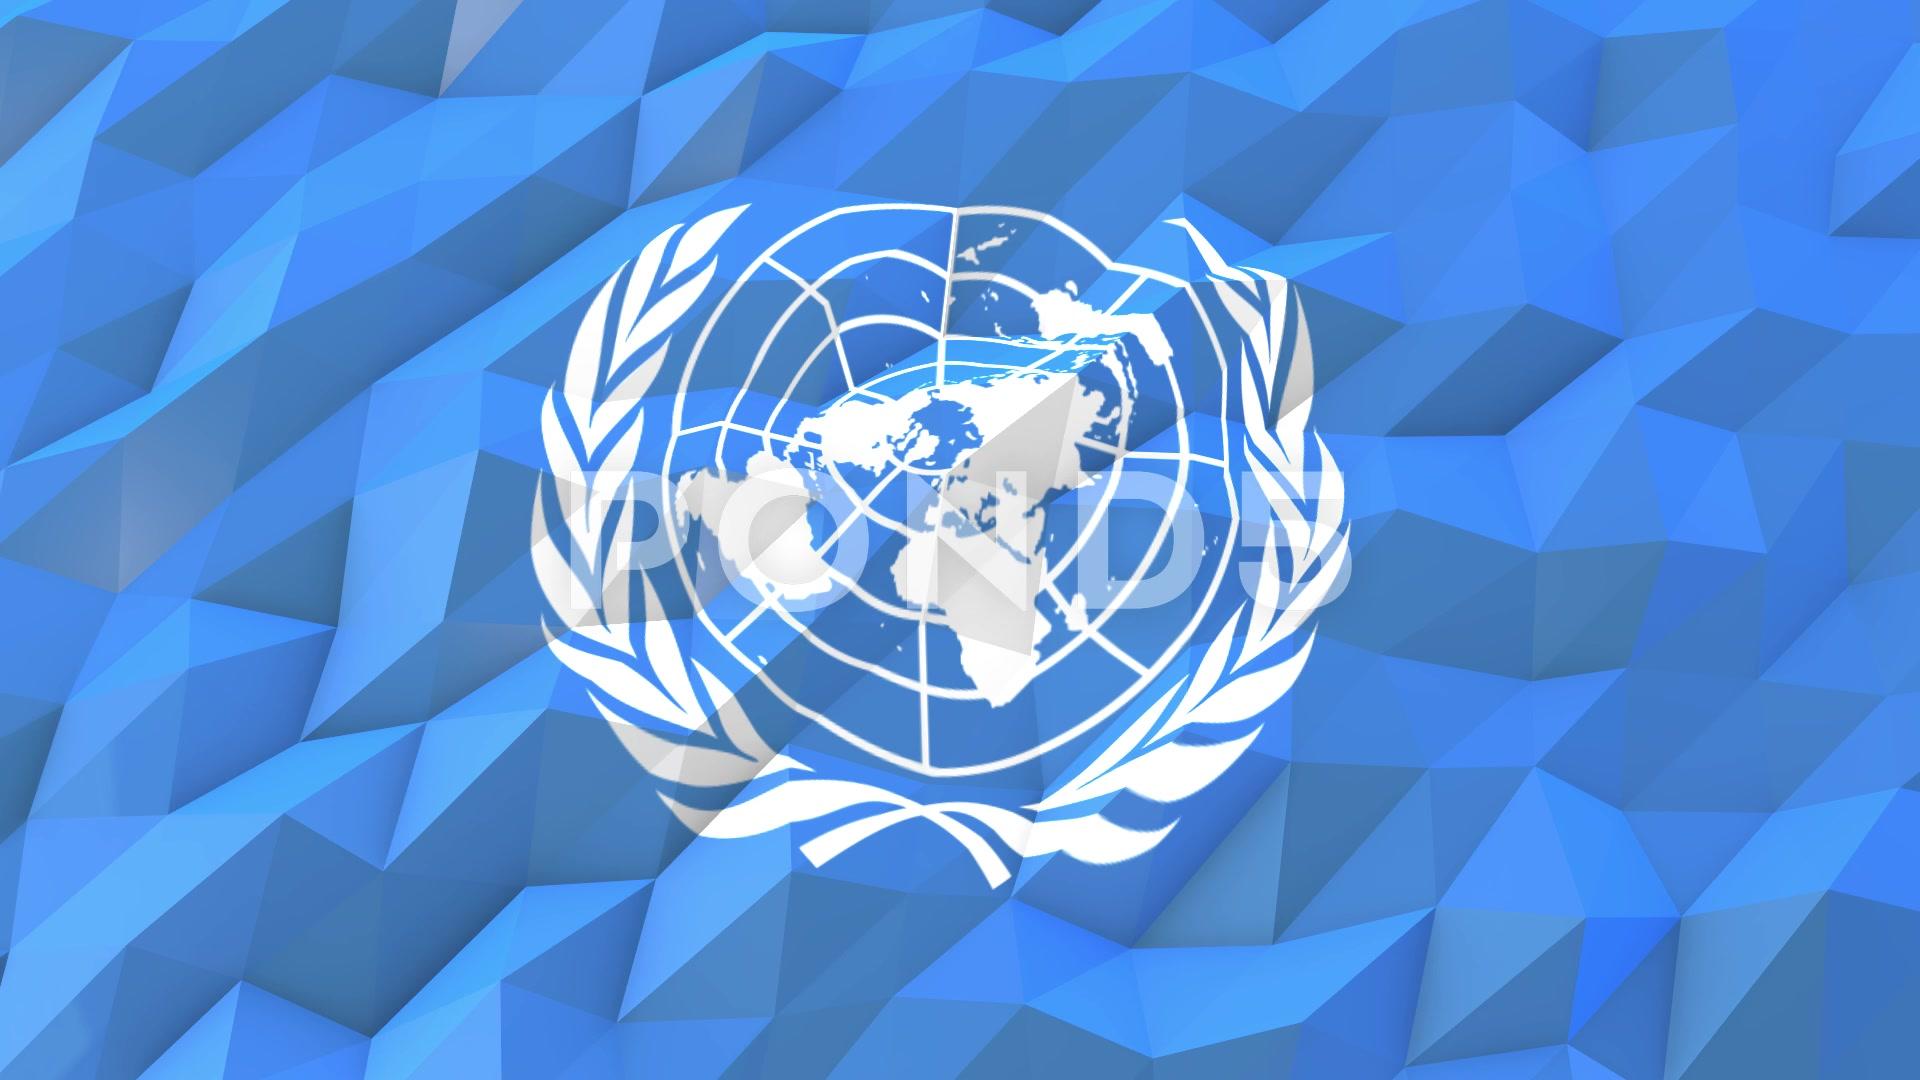 Flag of United Nations 3D Wallpaper Illustration Hi Res 66416526 1920x1080